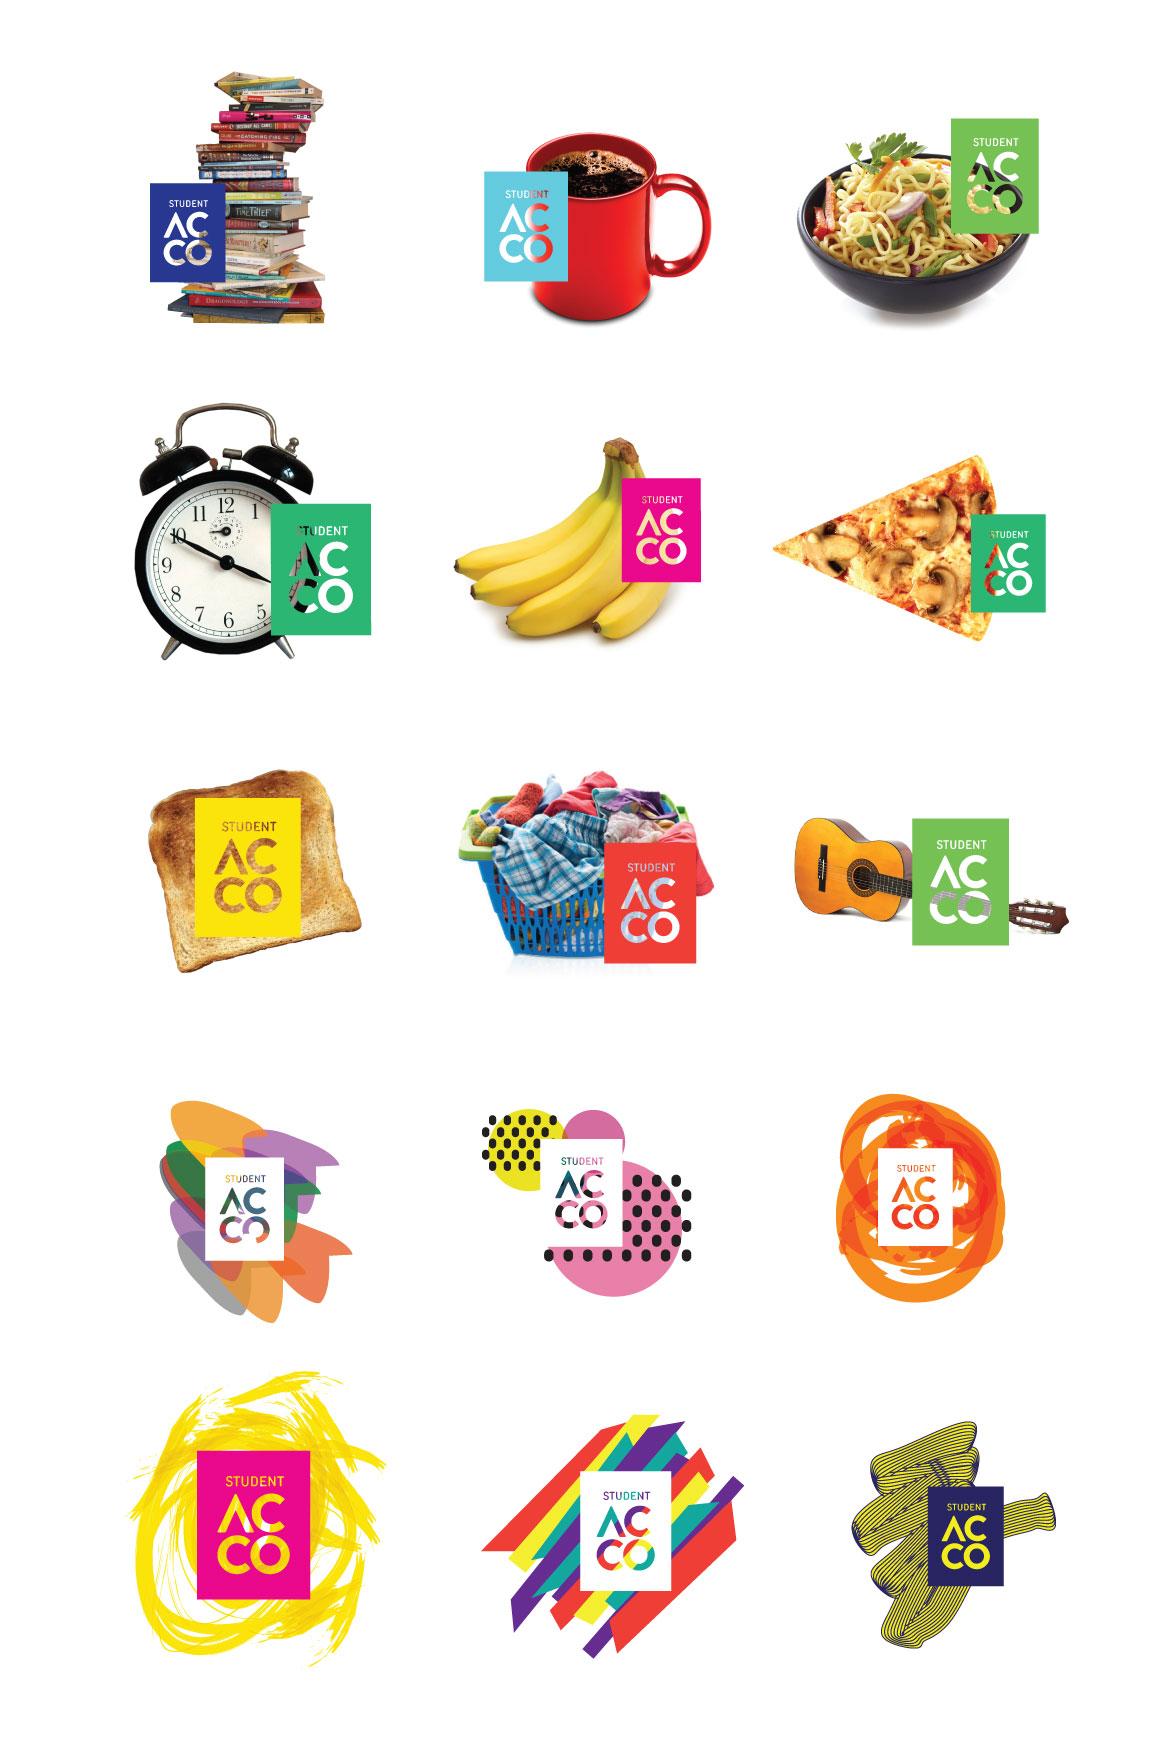 Student-Acco-Logos